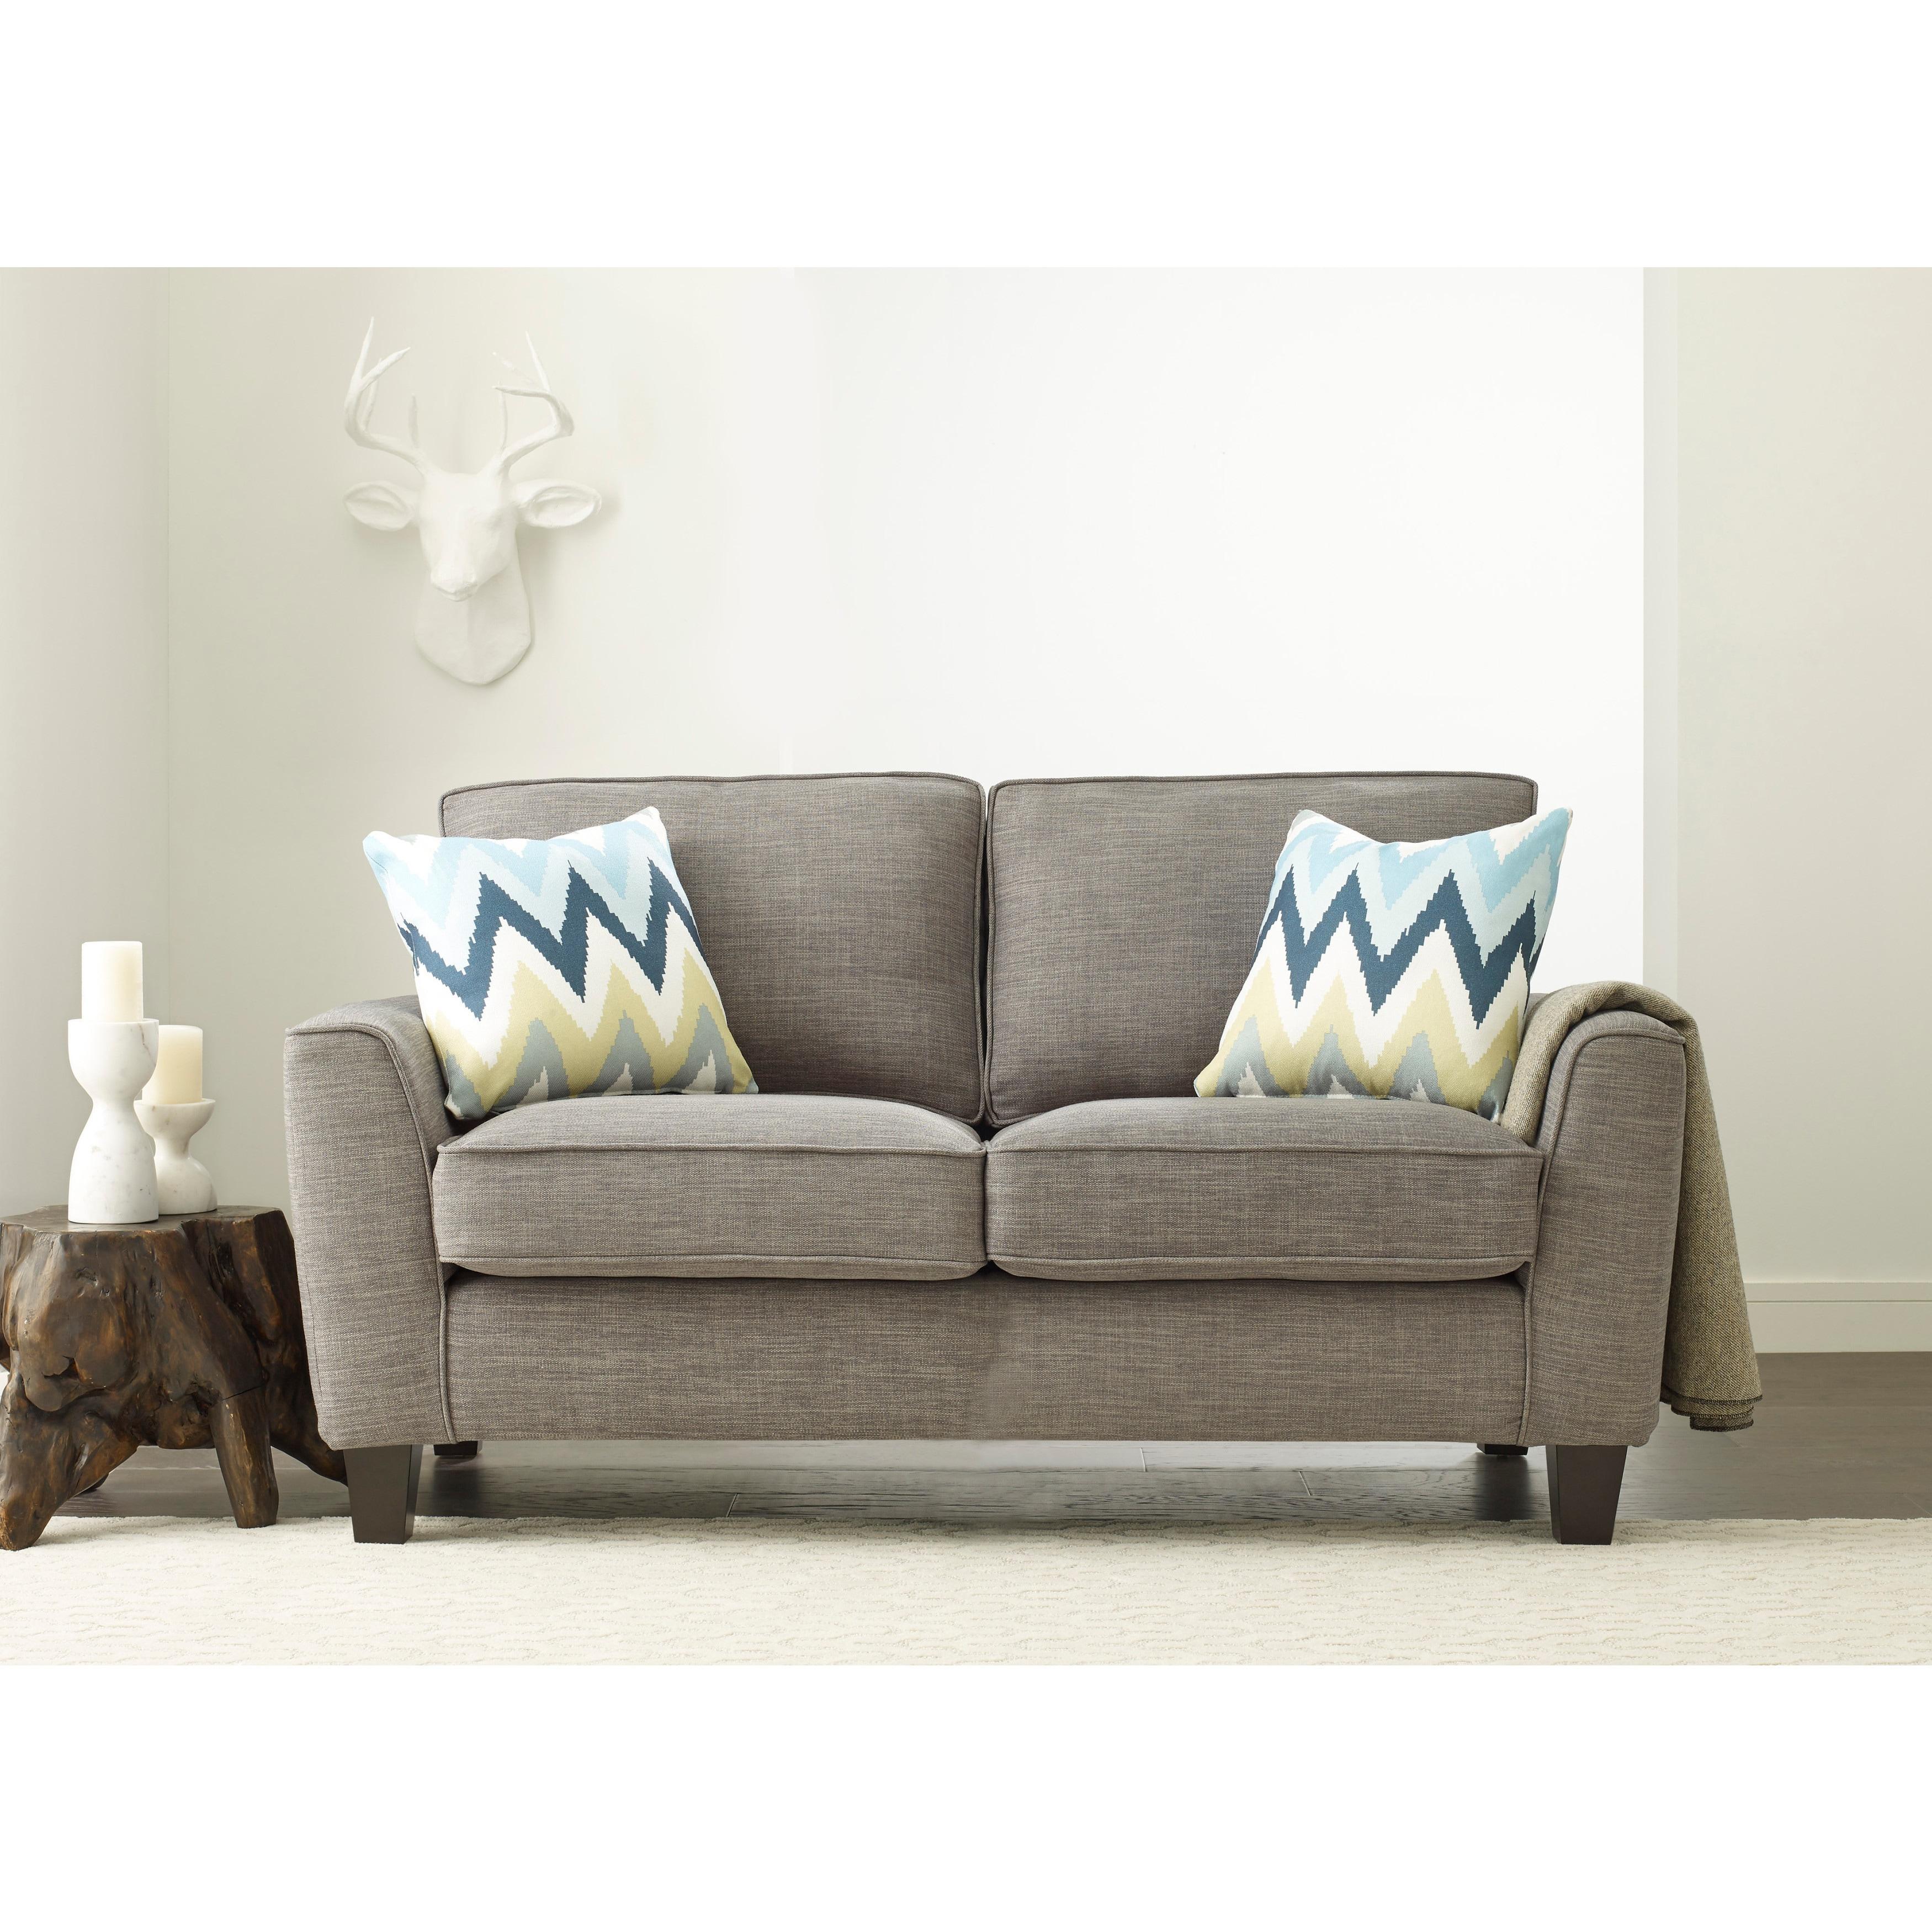 Shop Serta Astoria 61-inch Deep Seating Loveseat - Free Shipping ...